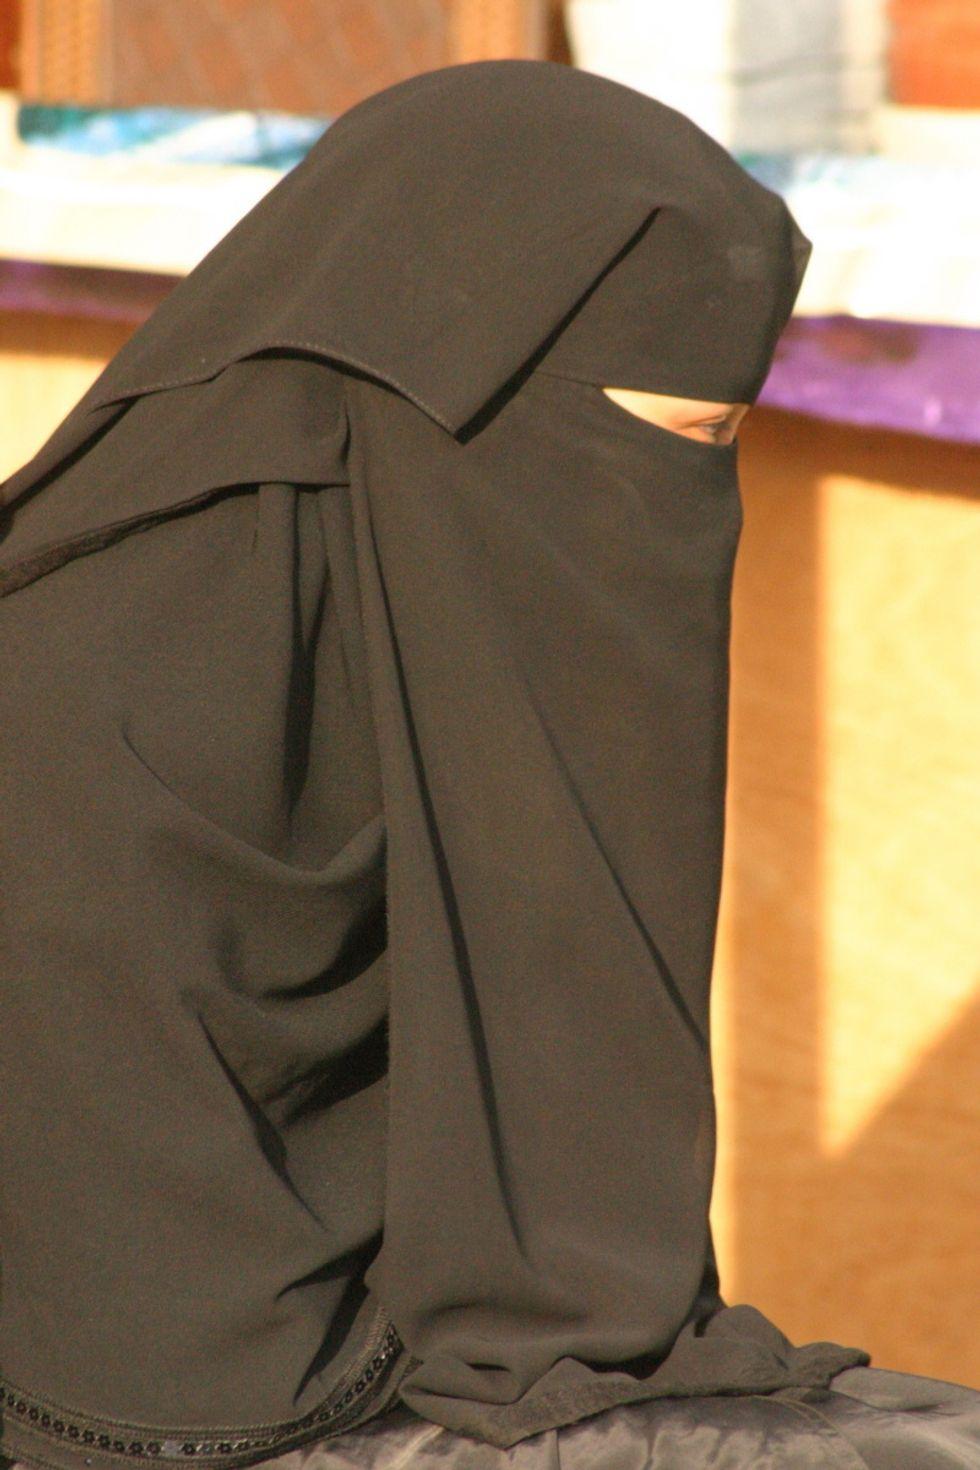 The Liberation of Saudi women begins